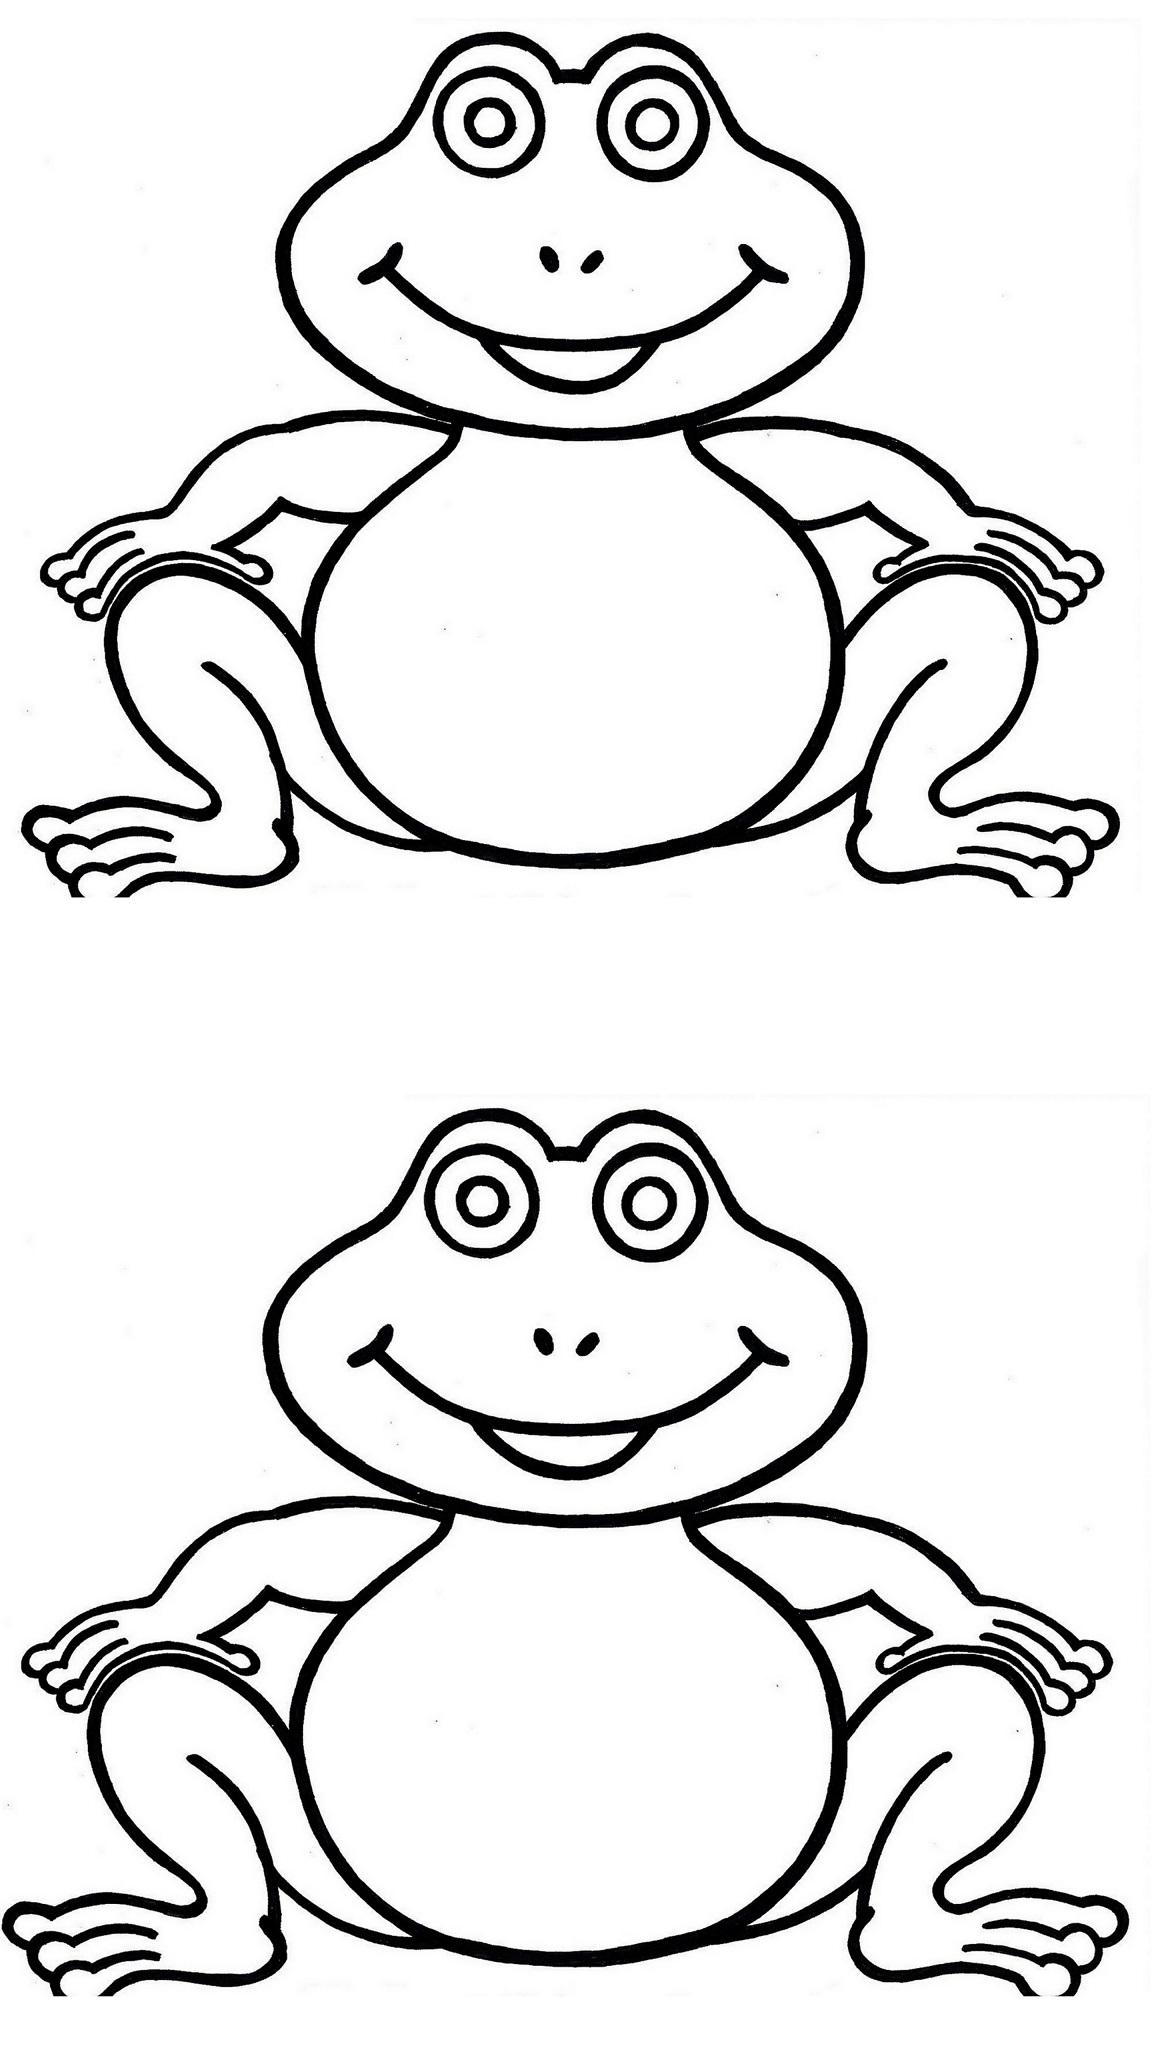 coloriage � dessiner dessiner une grenouille